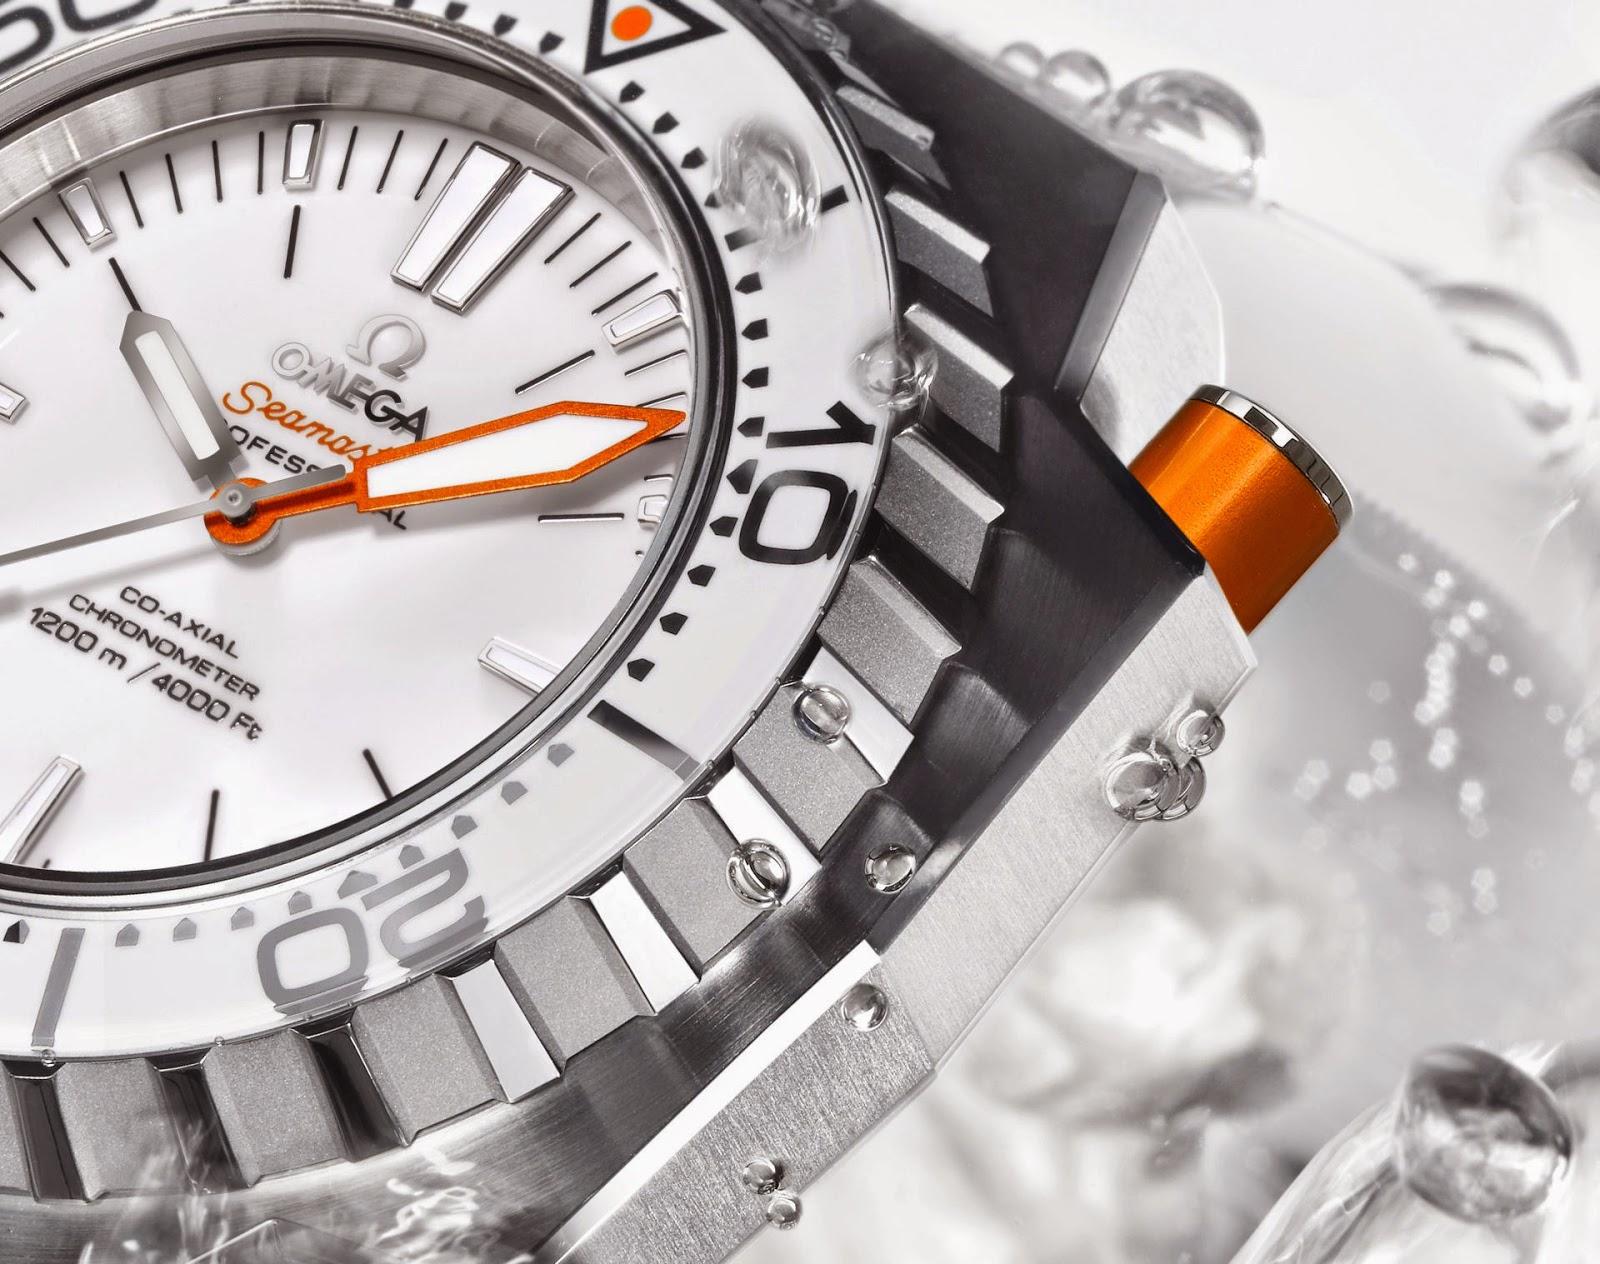 Omega Seamaster Ploprof 1200M White copy watch